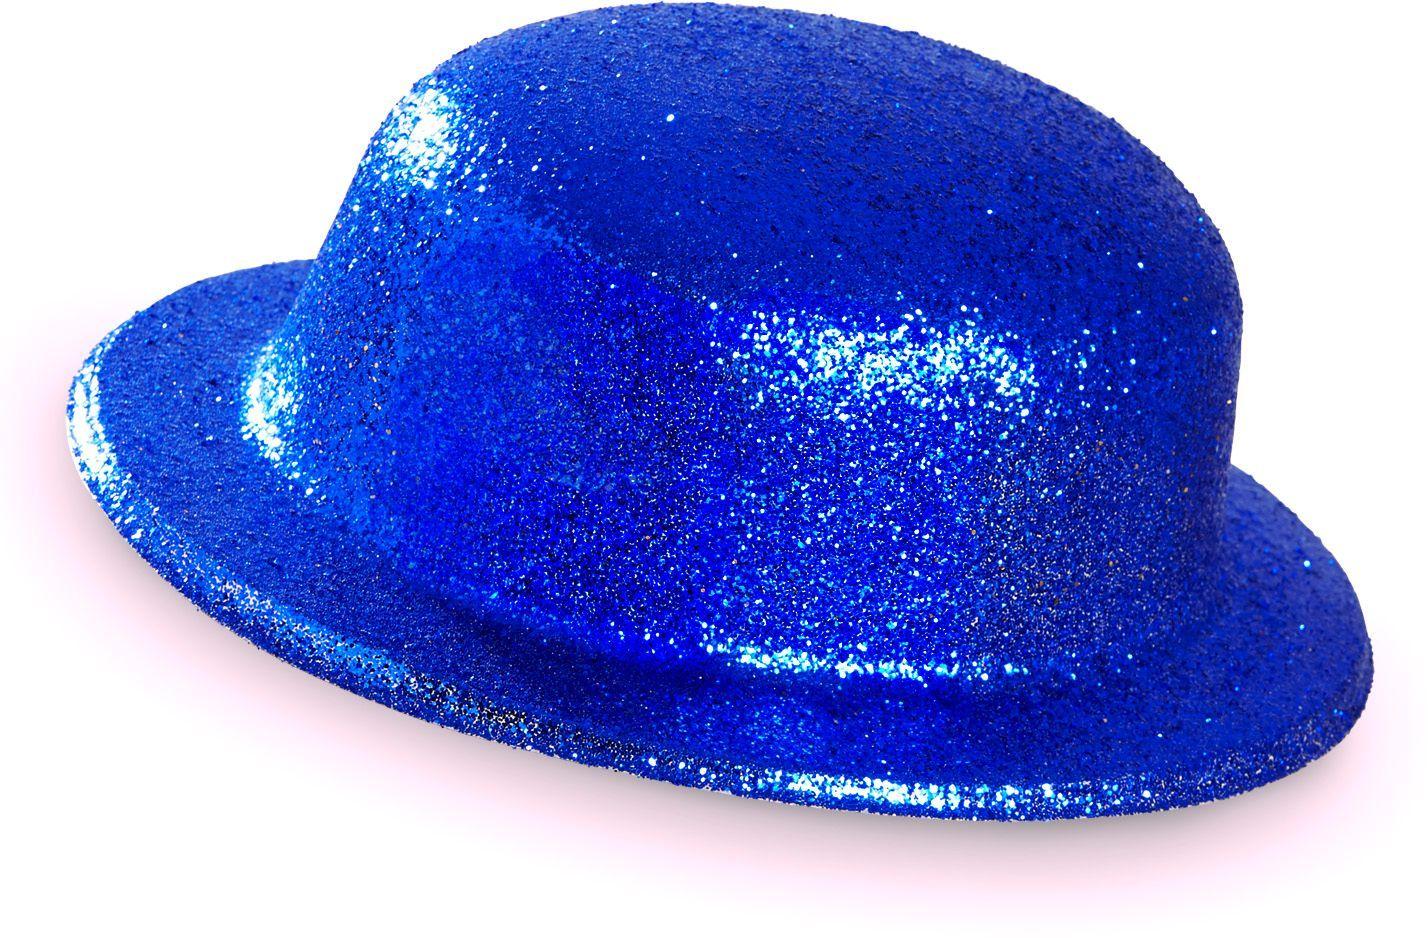 Blauwe glitter bolhoed